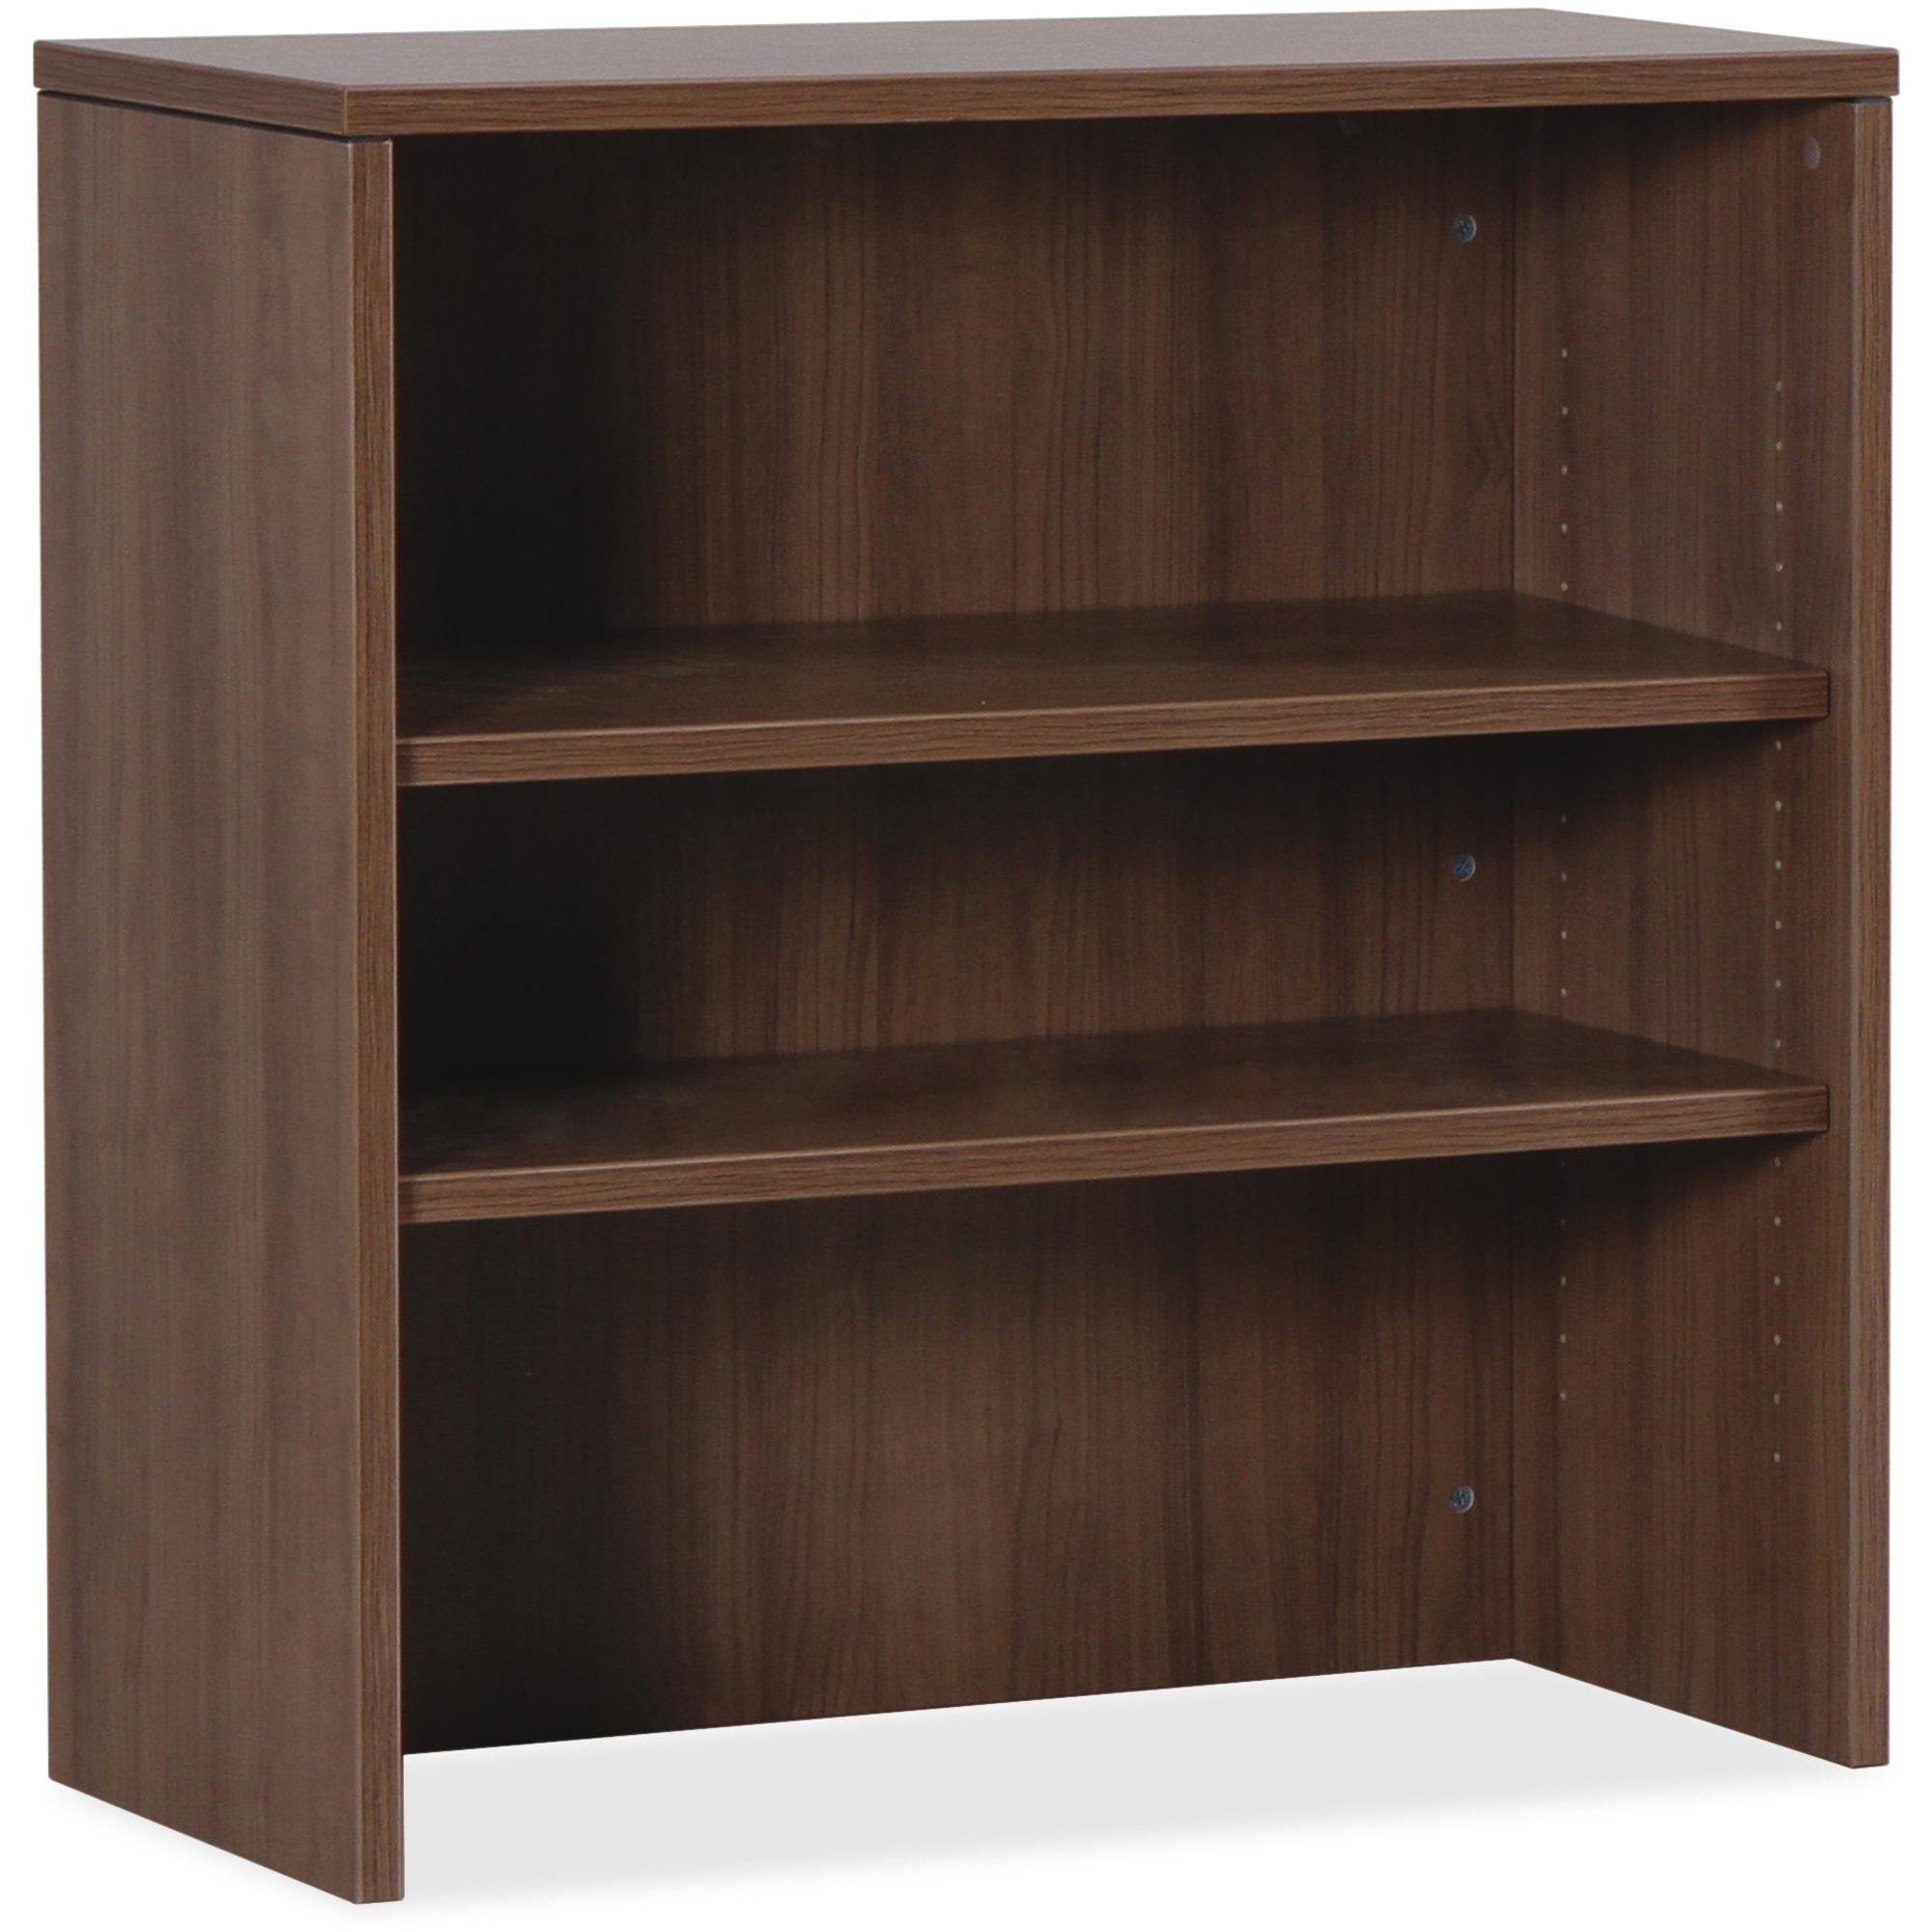 Lorell Essentials Walnut Laminate Stack On Bookshelf